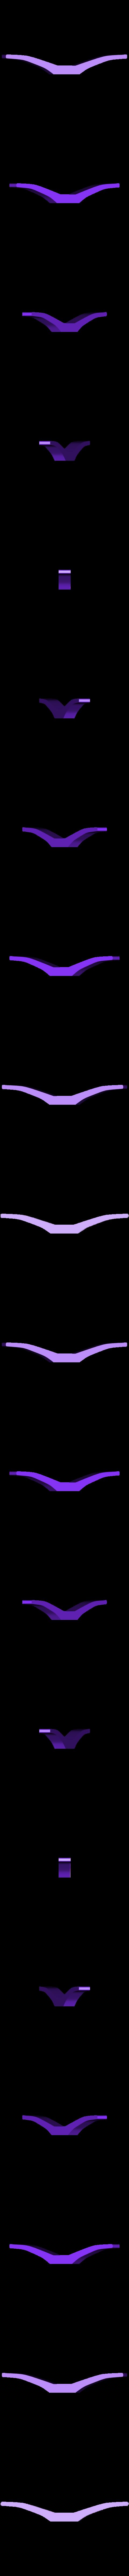 Tie Down Clip for Blinds v3.stl Download free STL file Window Blind Cord Tie-Down / Cord Winder • Model to 3D print, ProfessorFalken